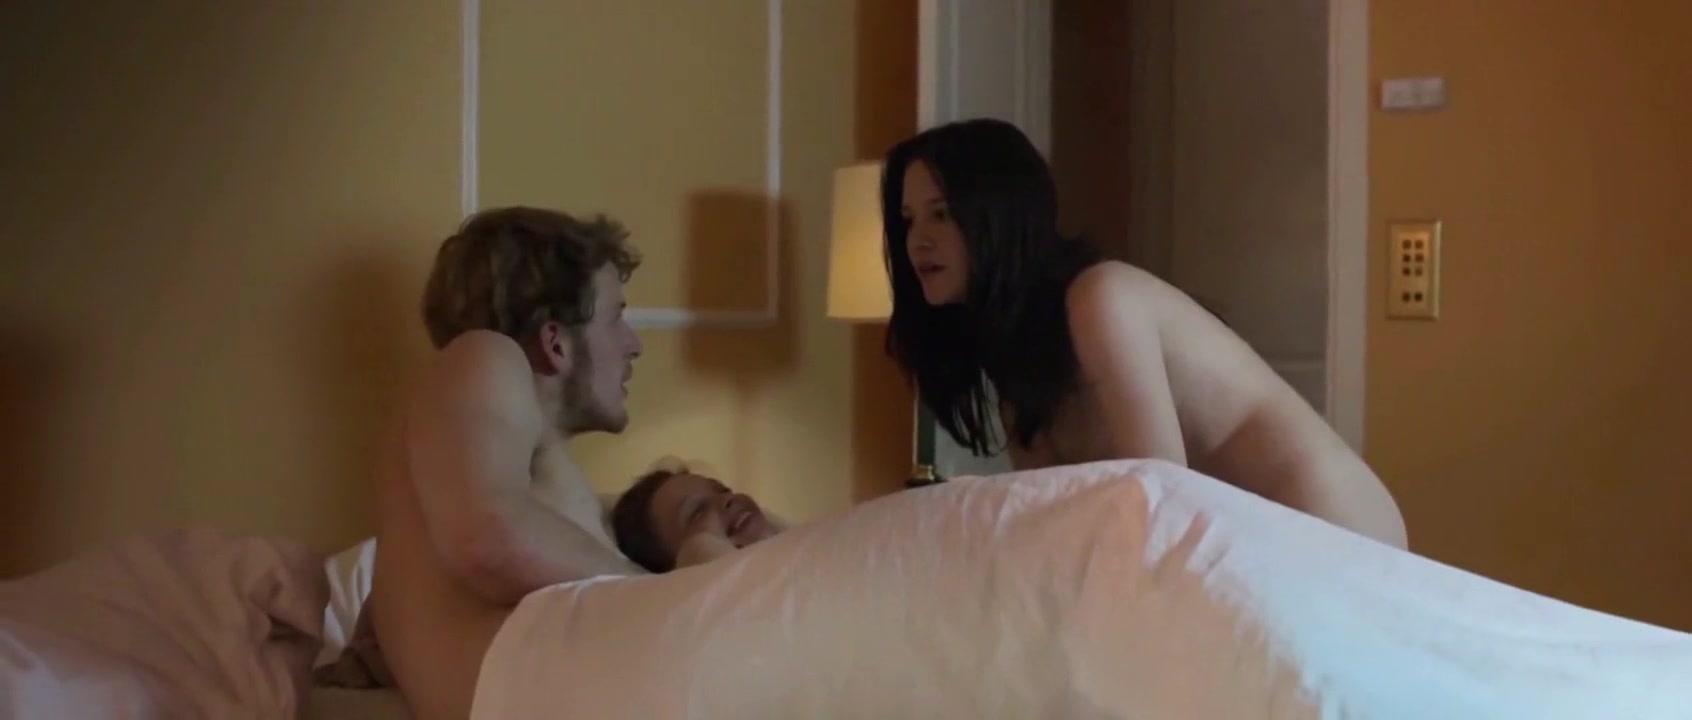 Audrey Bastien, Solene Rigot - Puppylove (2013) mature small floppy breast photos video